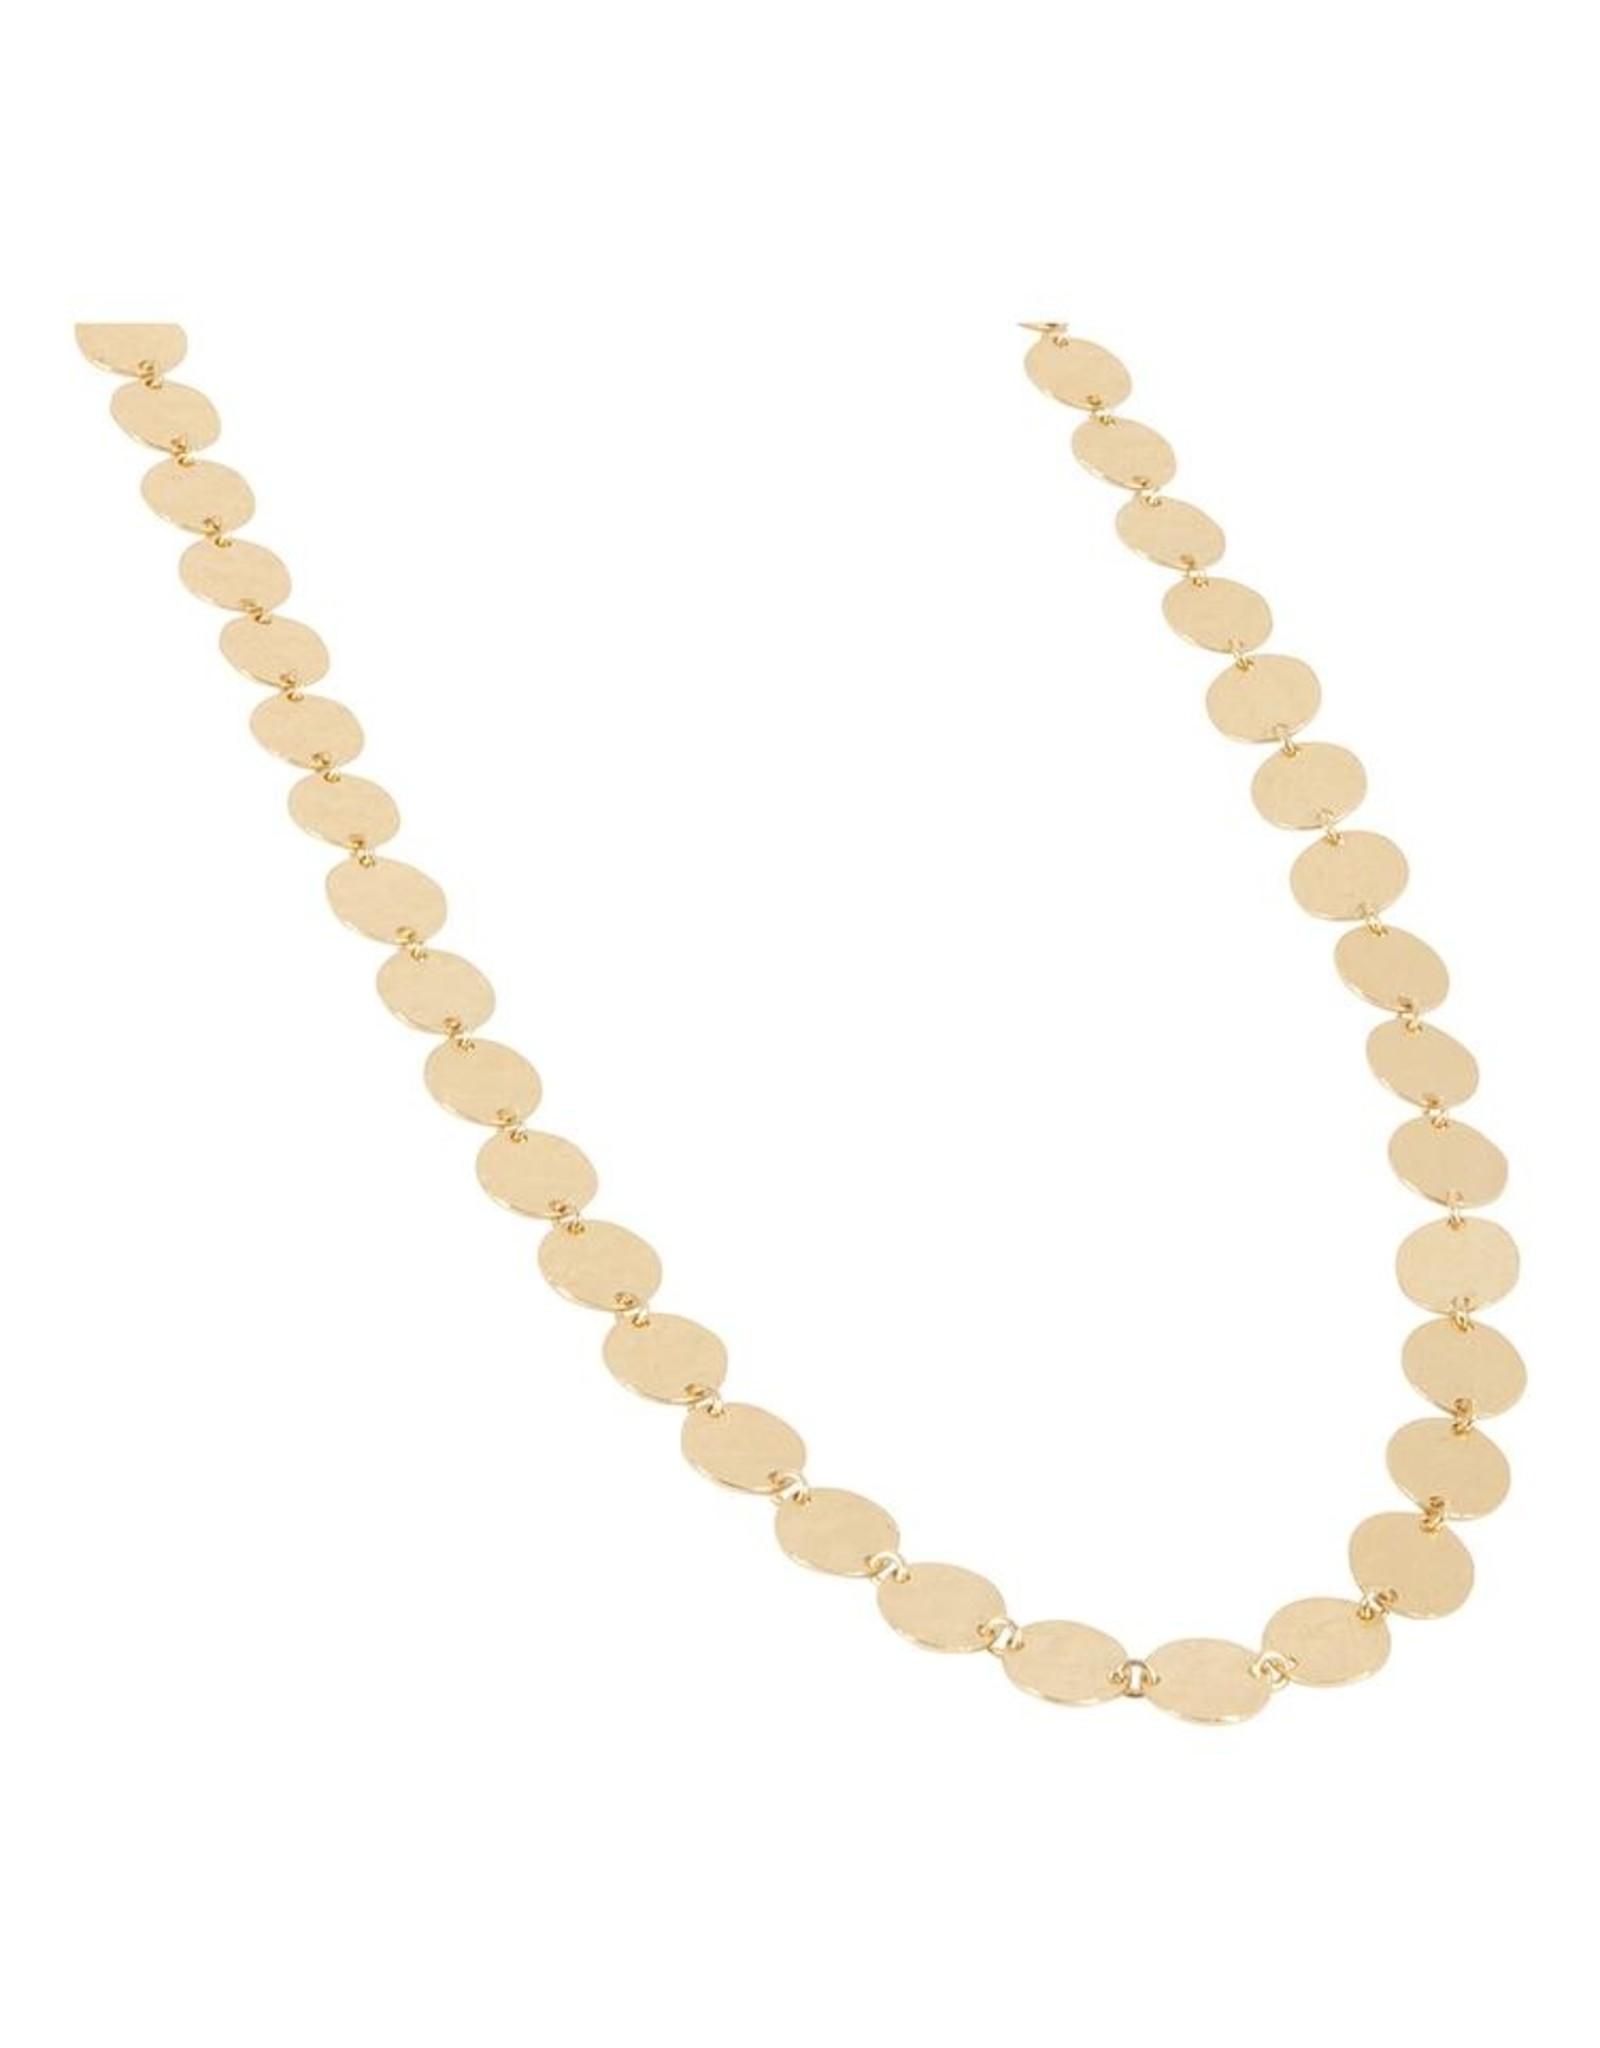 Halskette Disc 925 Silber vergoldet